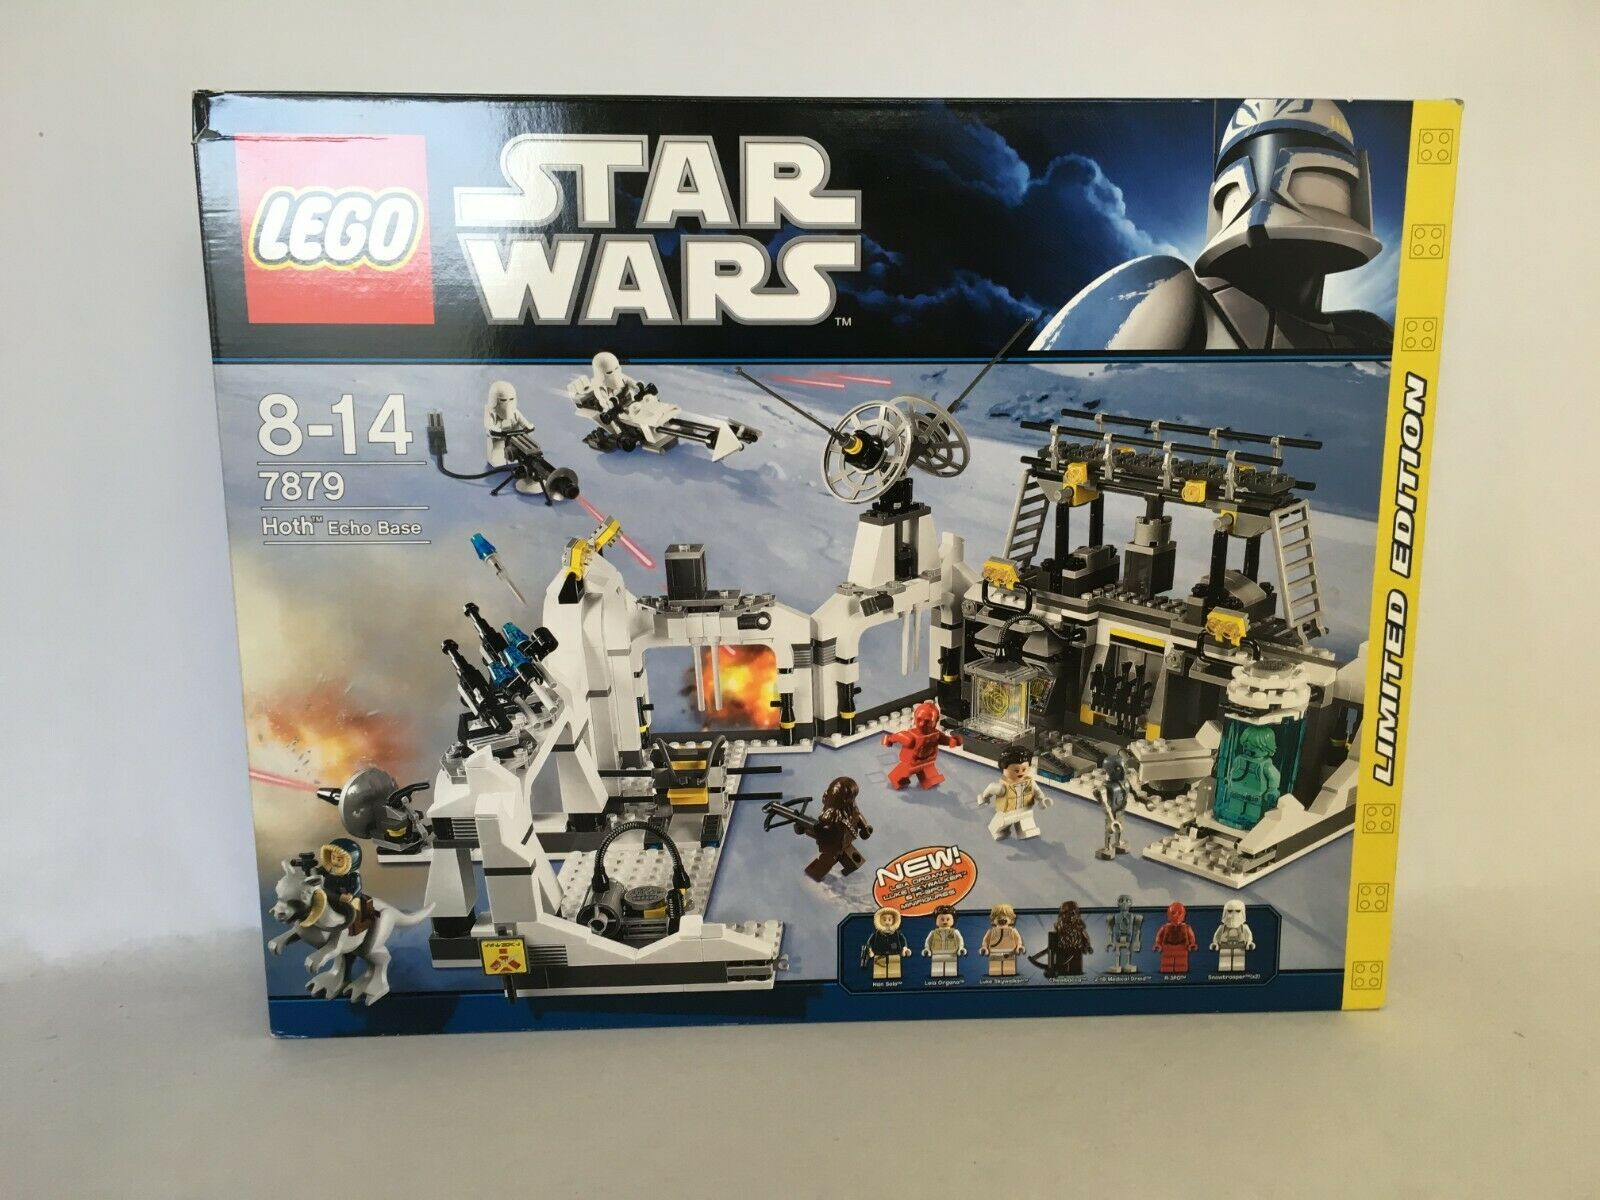 Lego ® Estrella Wars 7879 Hoth echo base